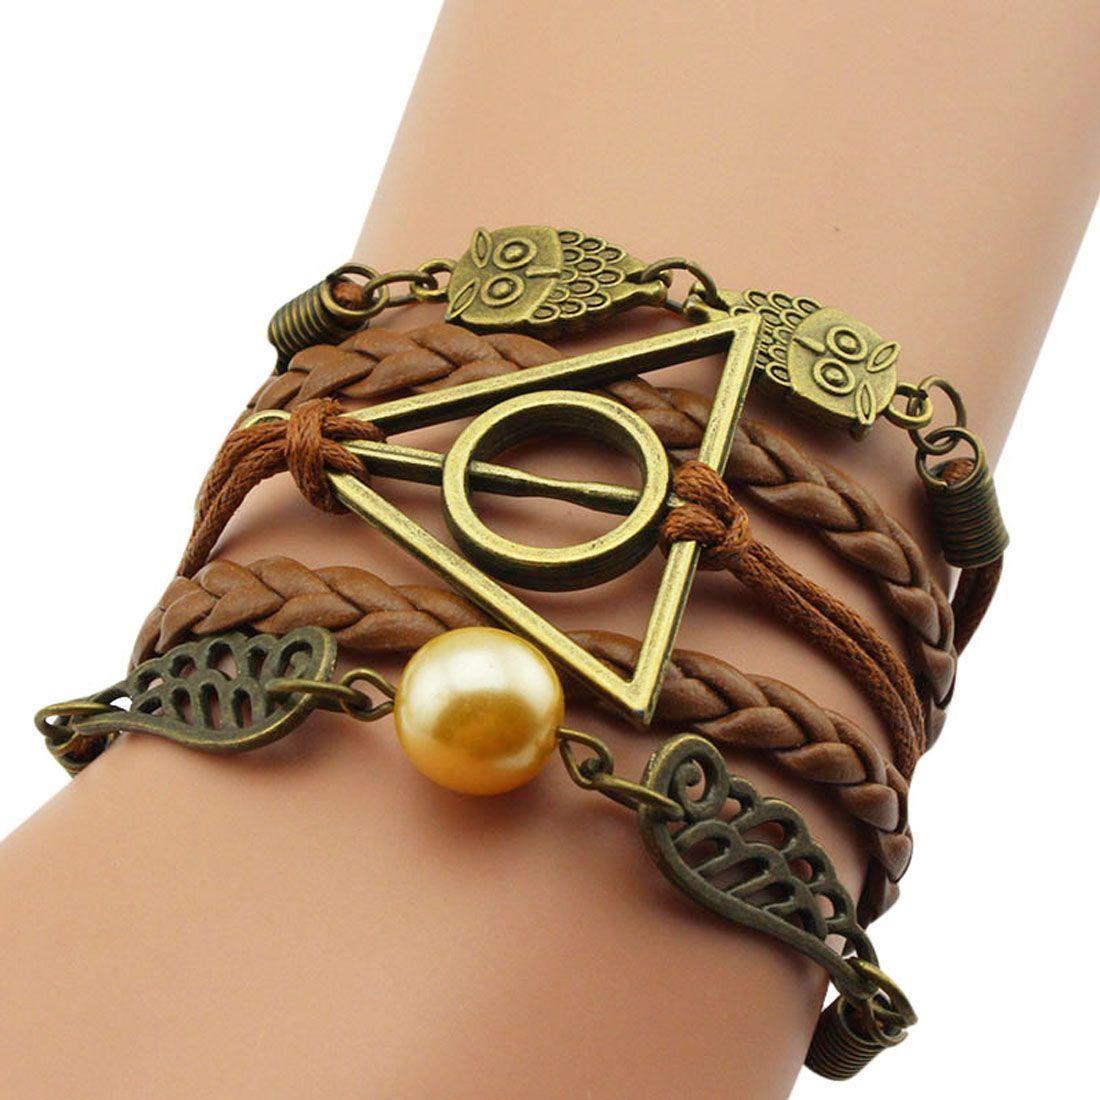 New retro fashion accessories womens jewelry lady multilayer bangle